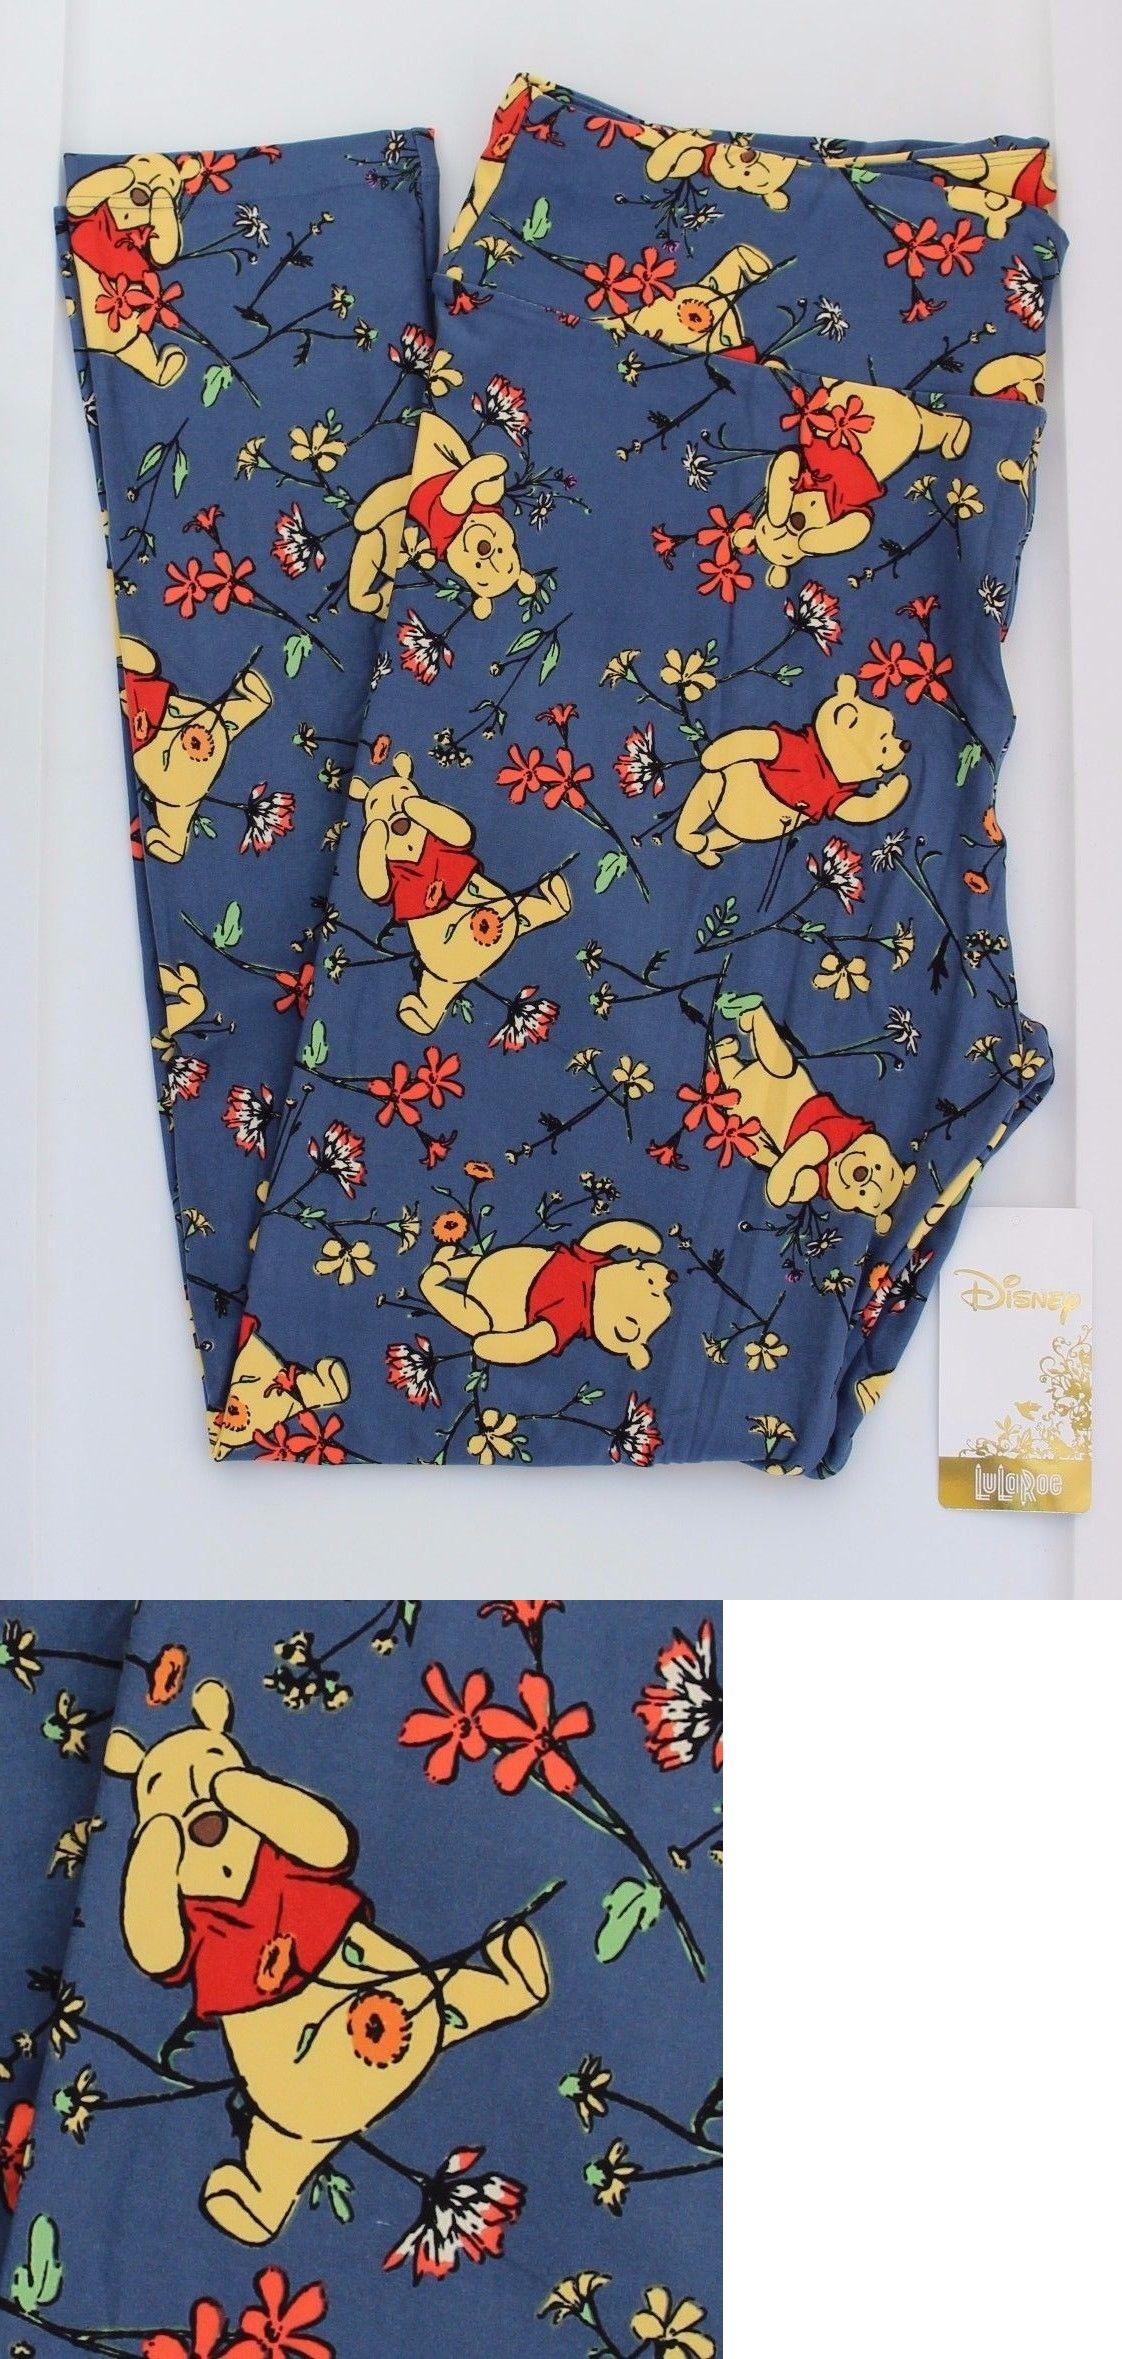 ab326c3a41004f Leggings 169001: Tc Lularoe Disney Leggings Winnie The Pooh Tall And Curvy  Blue Rare Unicorn ! Nwt -> BUY IT NOW ONLY: $53.95 on eBay!